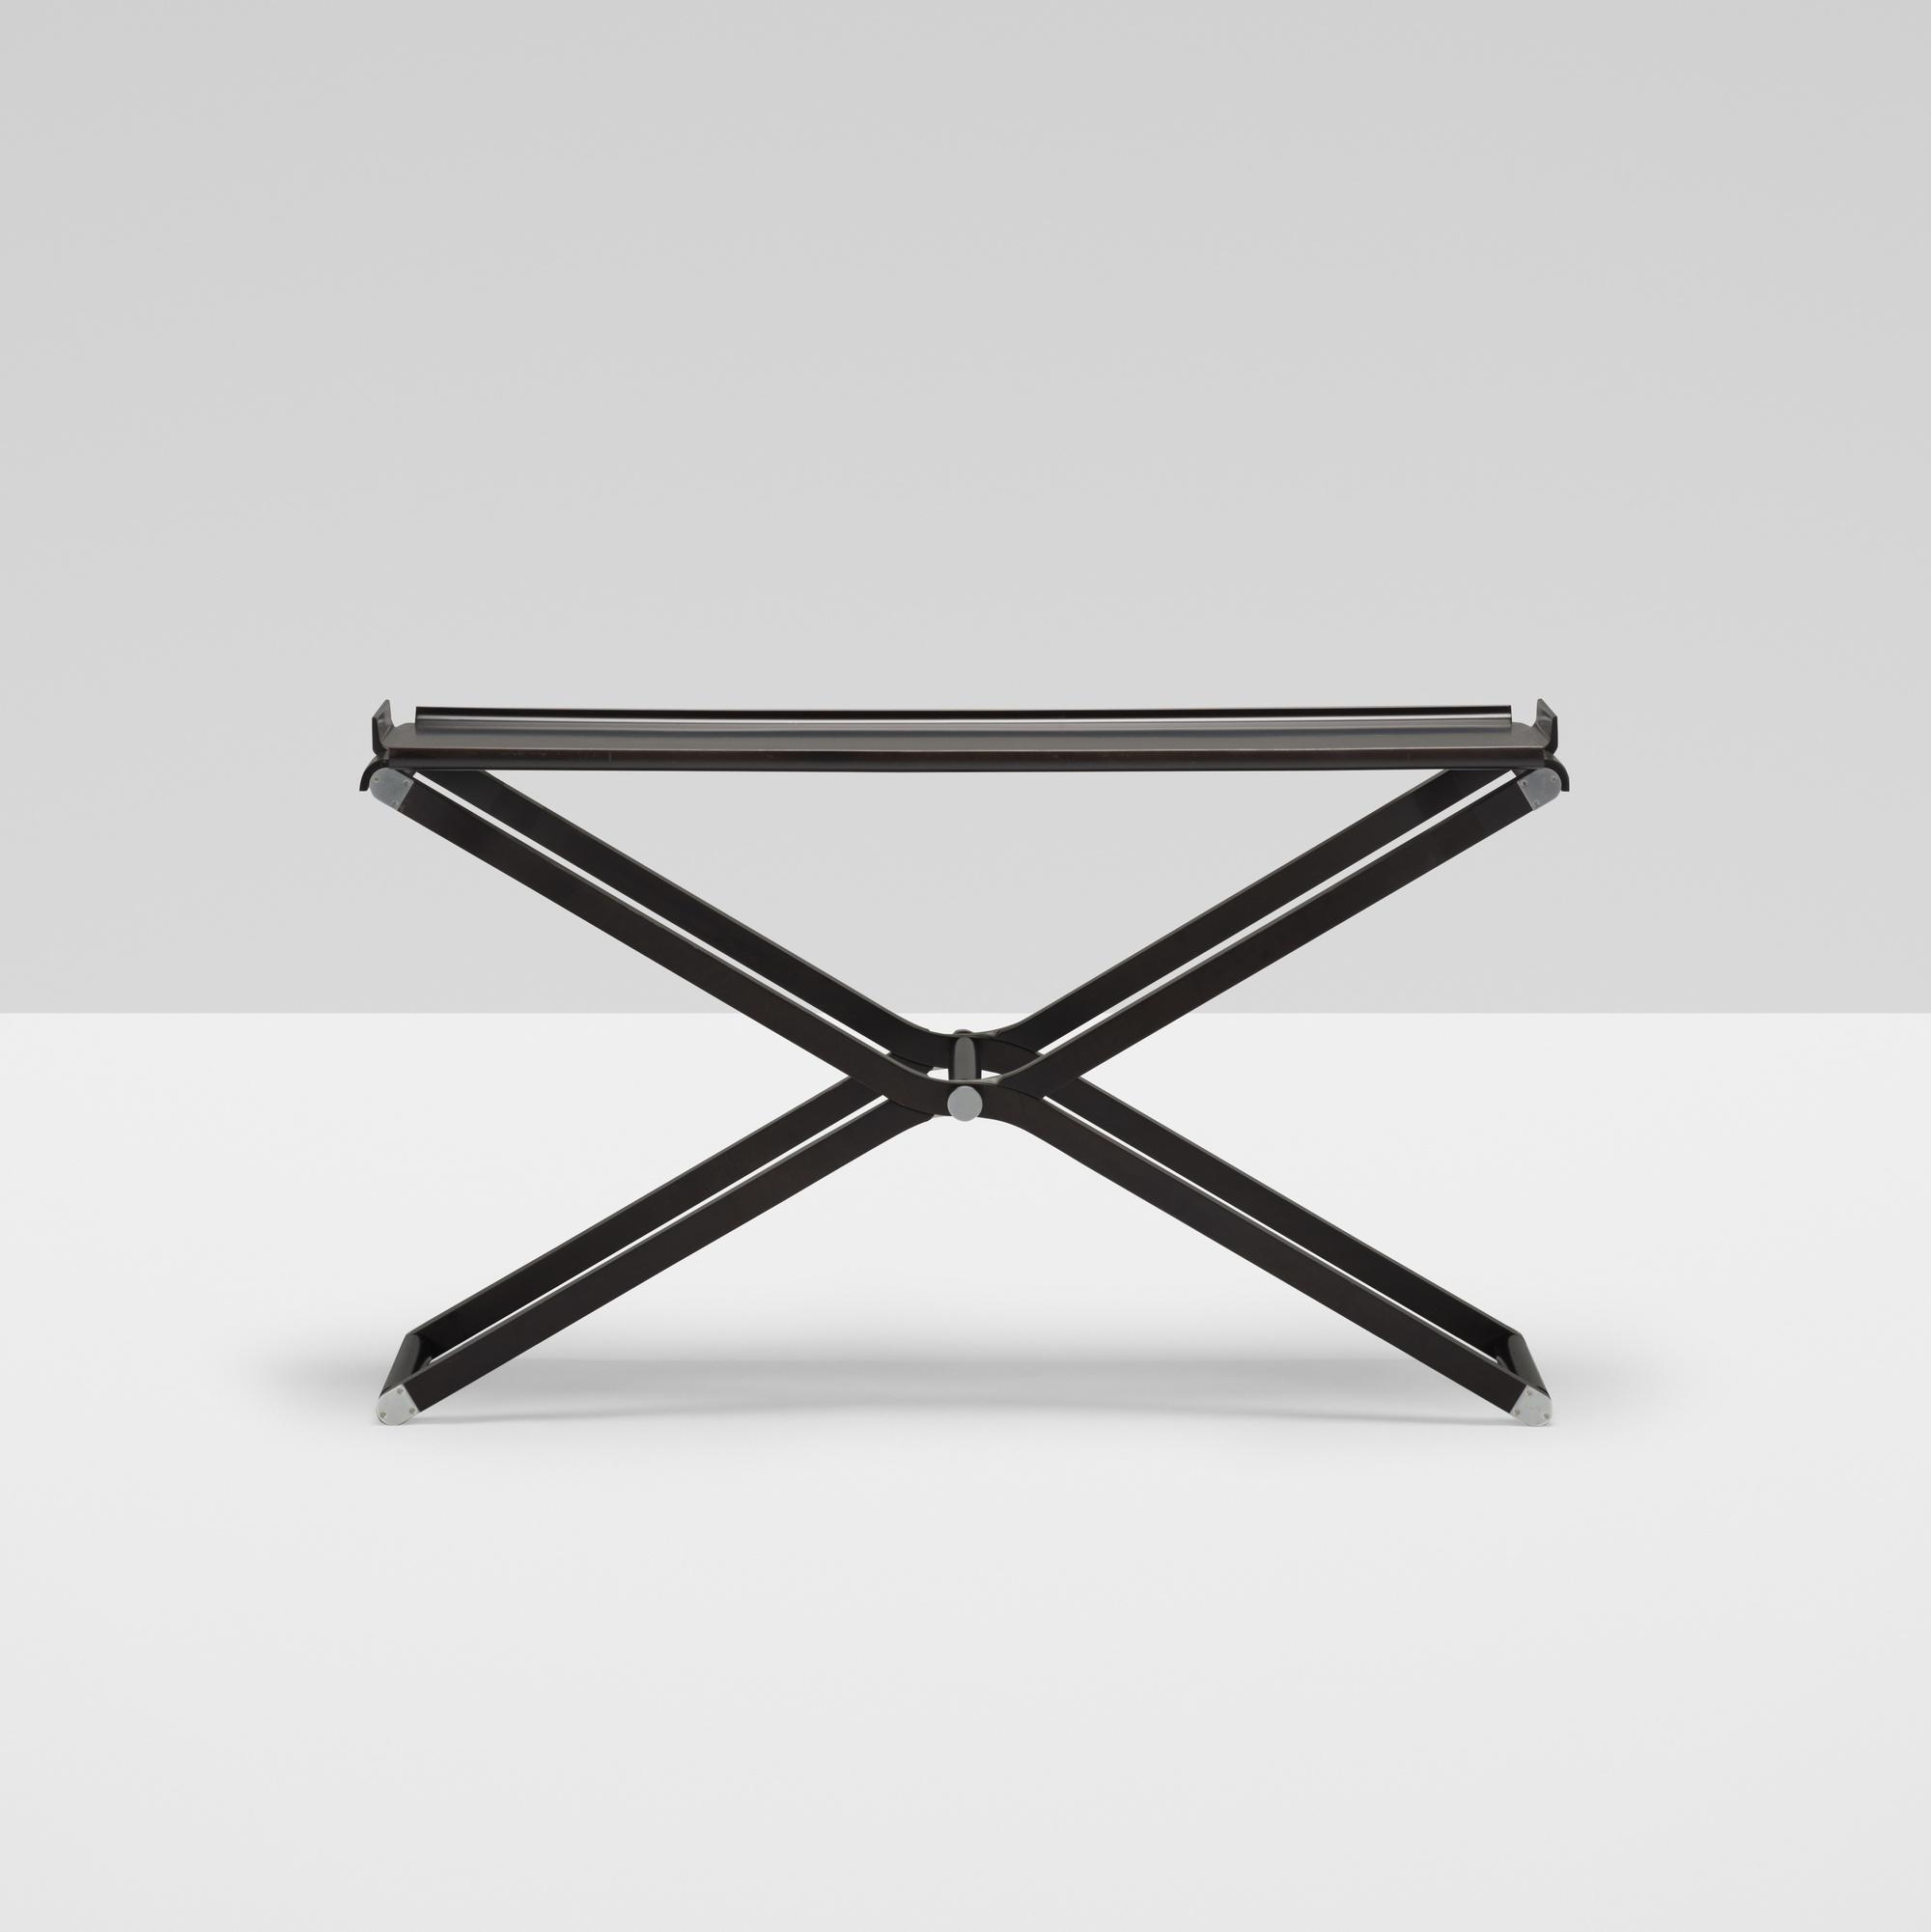 230: HERMÈS, Pippa console < Important Design, 11 December 2018